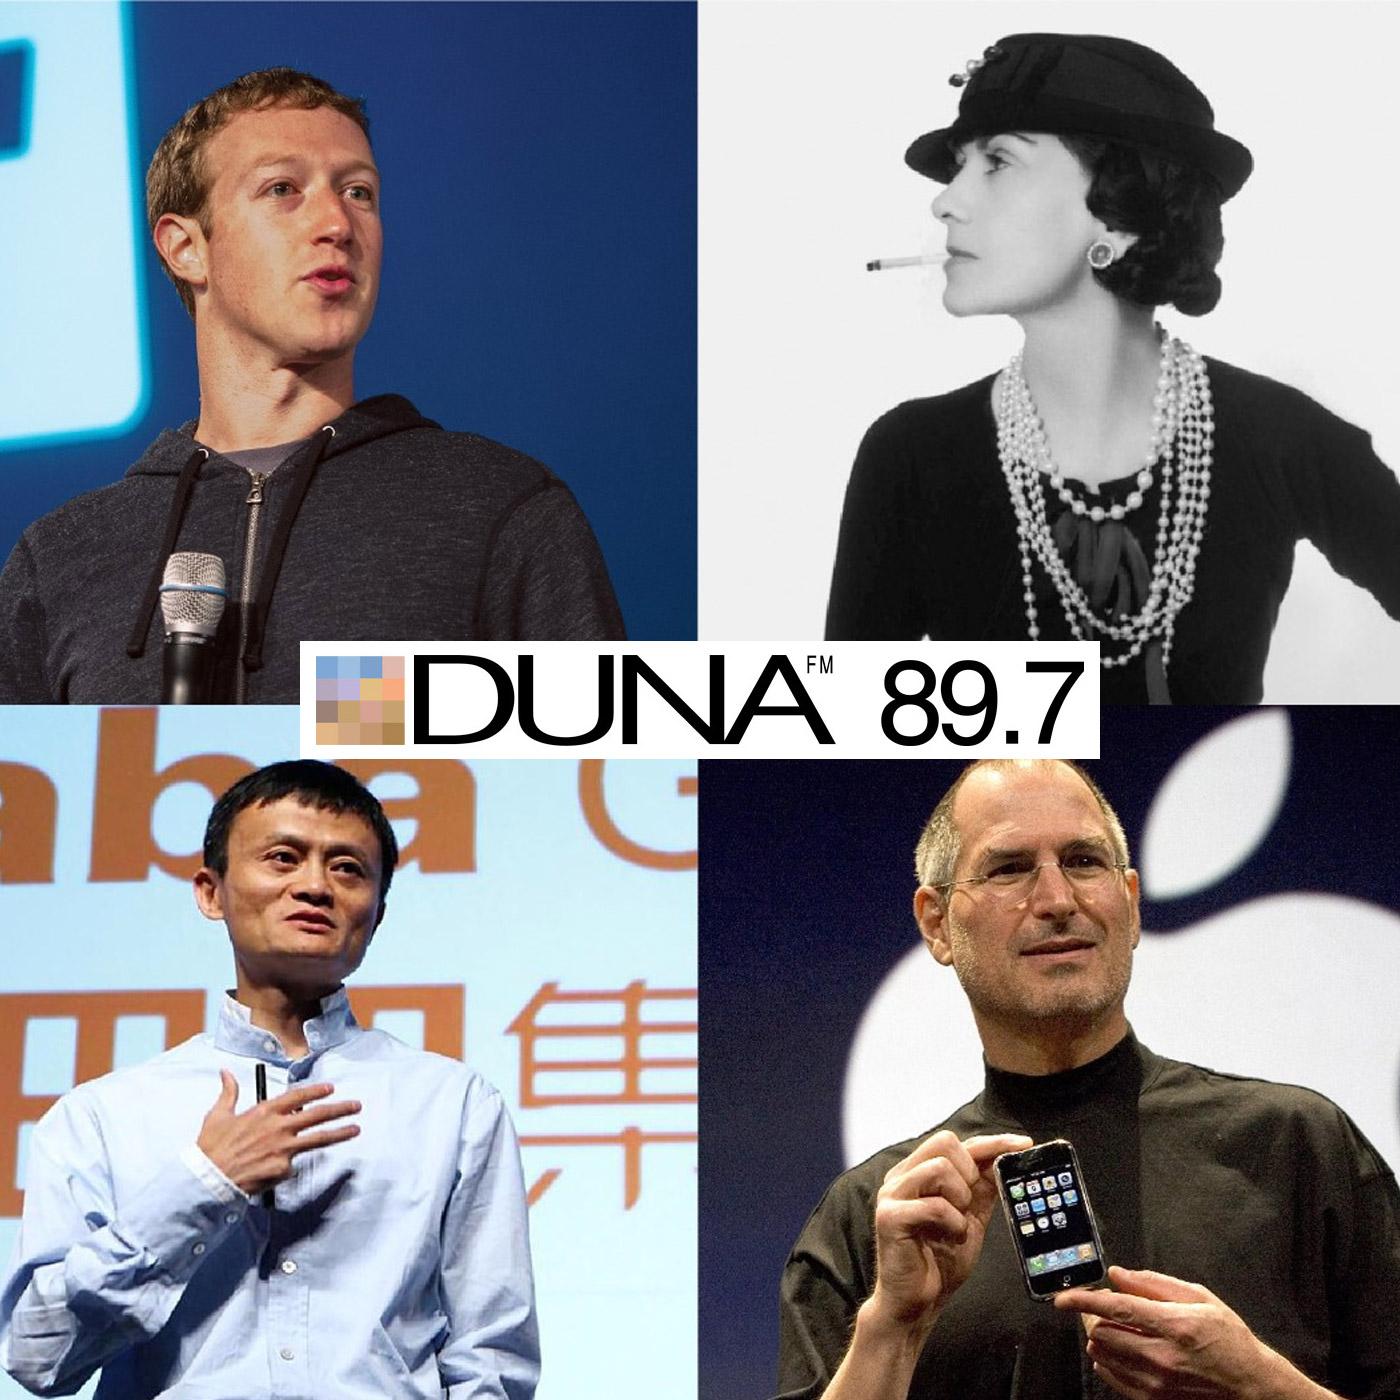 Radio Duna - Visionarios